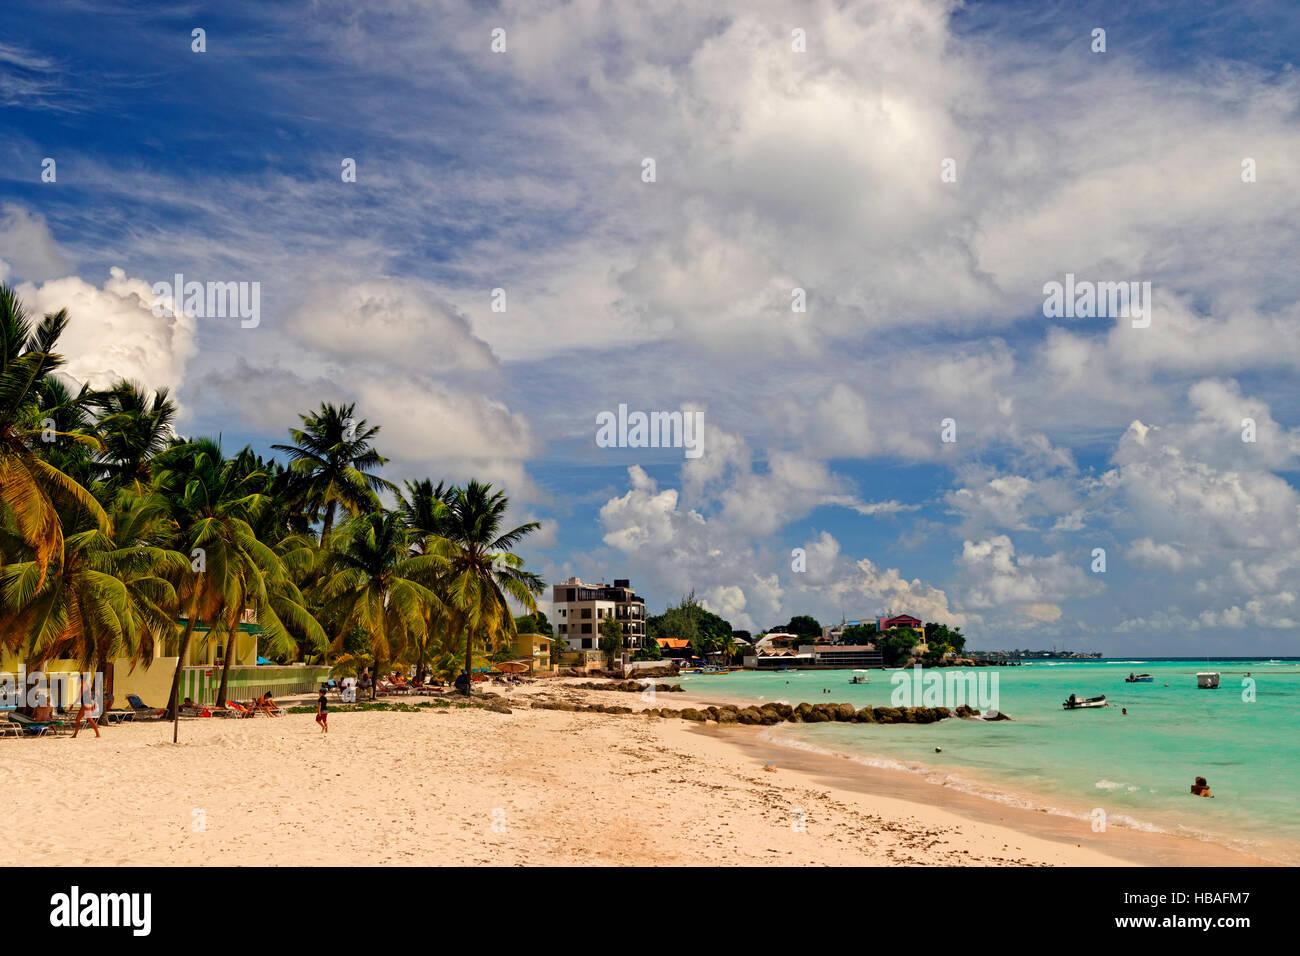 Worthing Beach a Worthing, tra St. Lawrence Gap e Bridgetown, costa sud di Barbados, dei Caraibi. Foto Stock